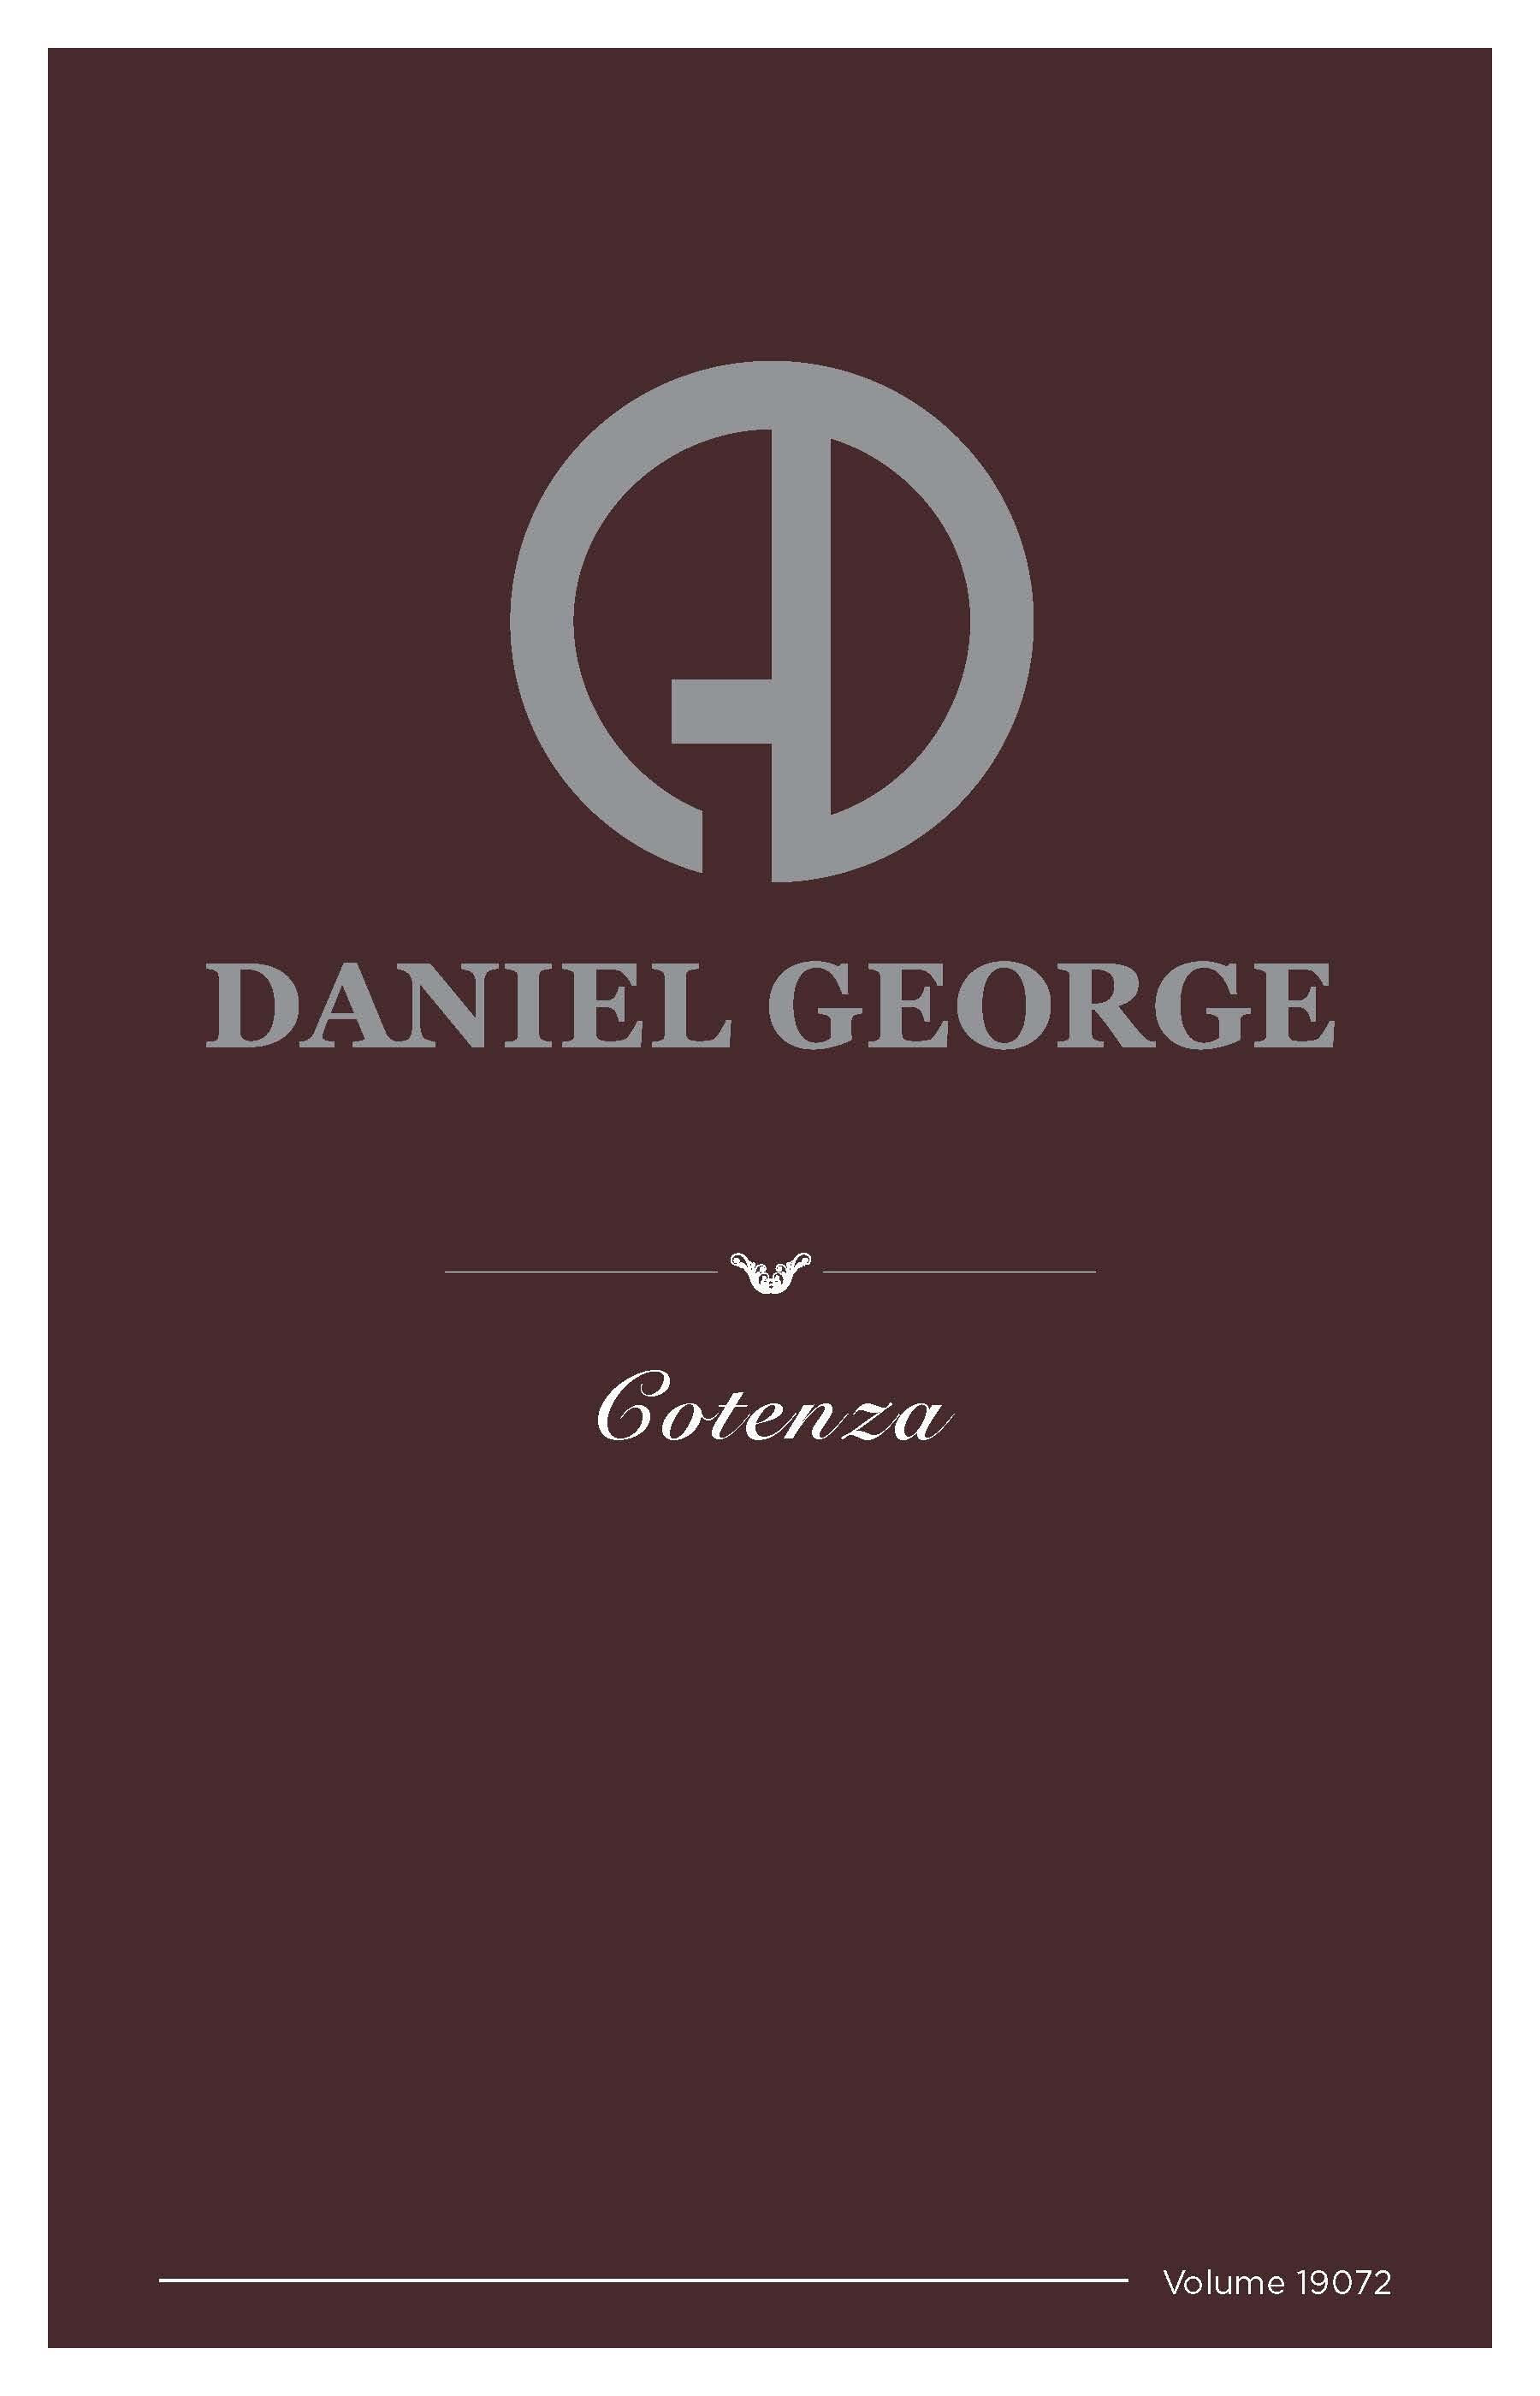 digital_collection_DG_cotenza_19072.jpg